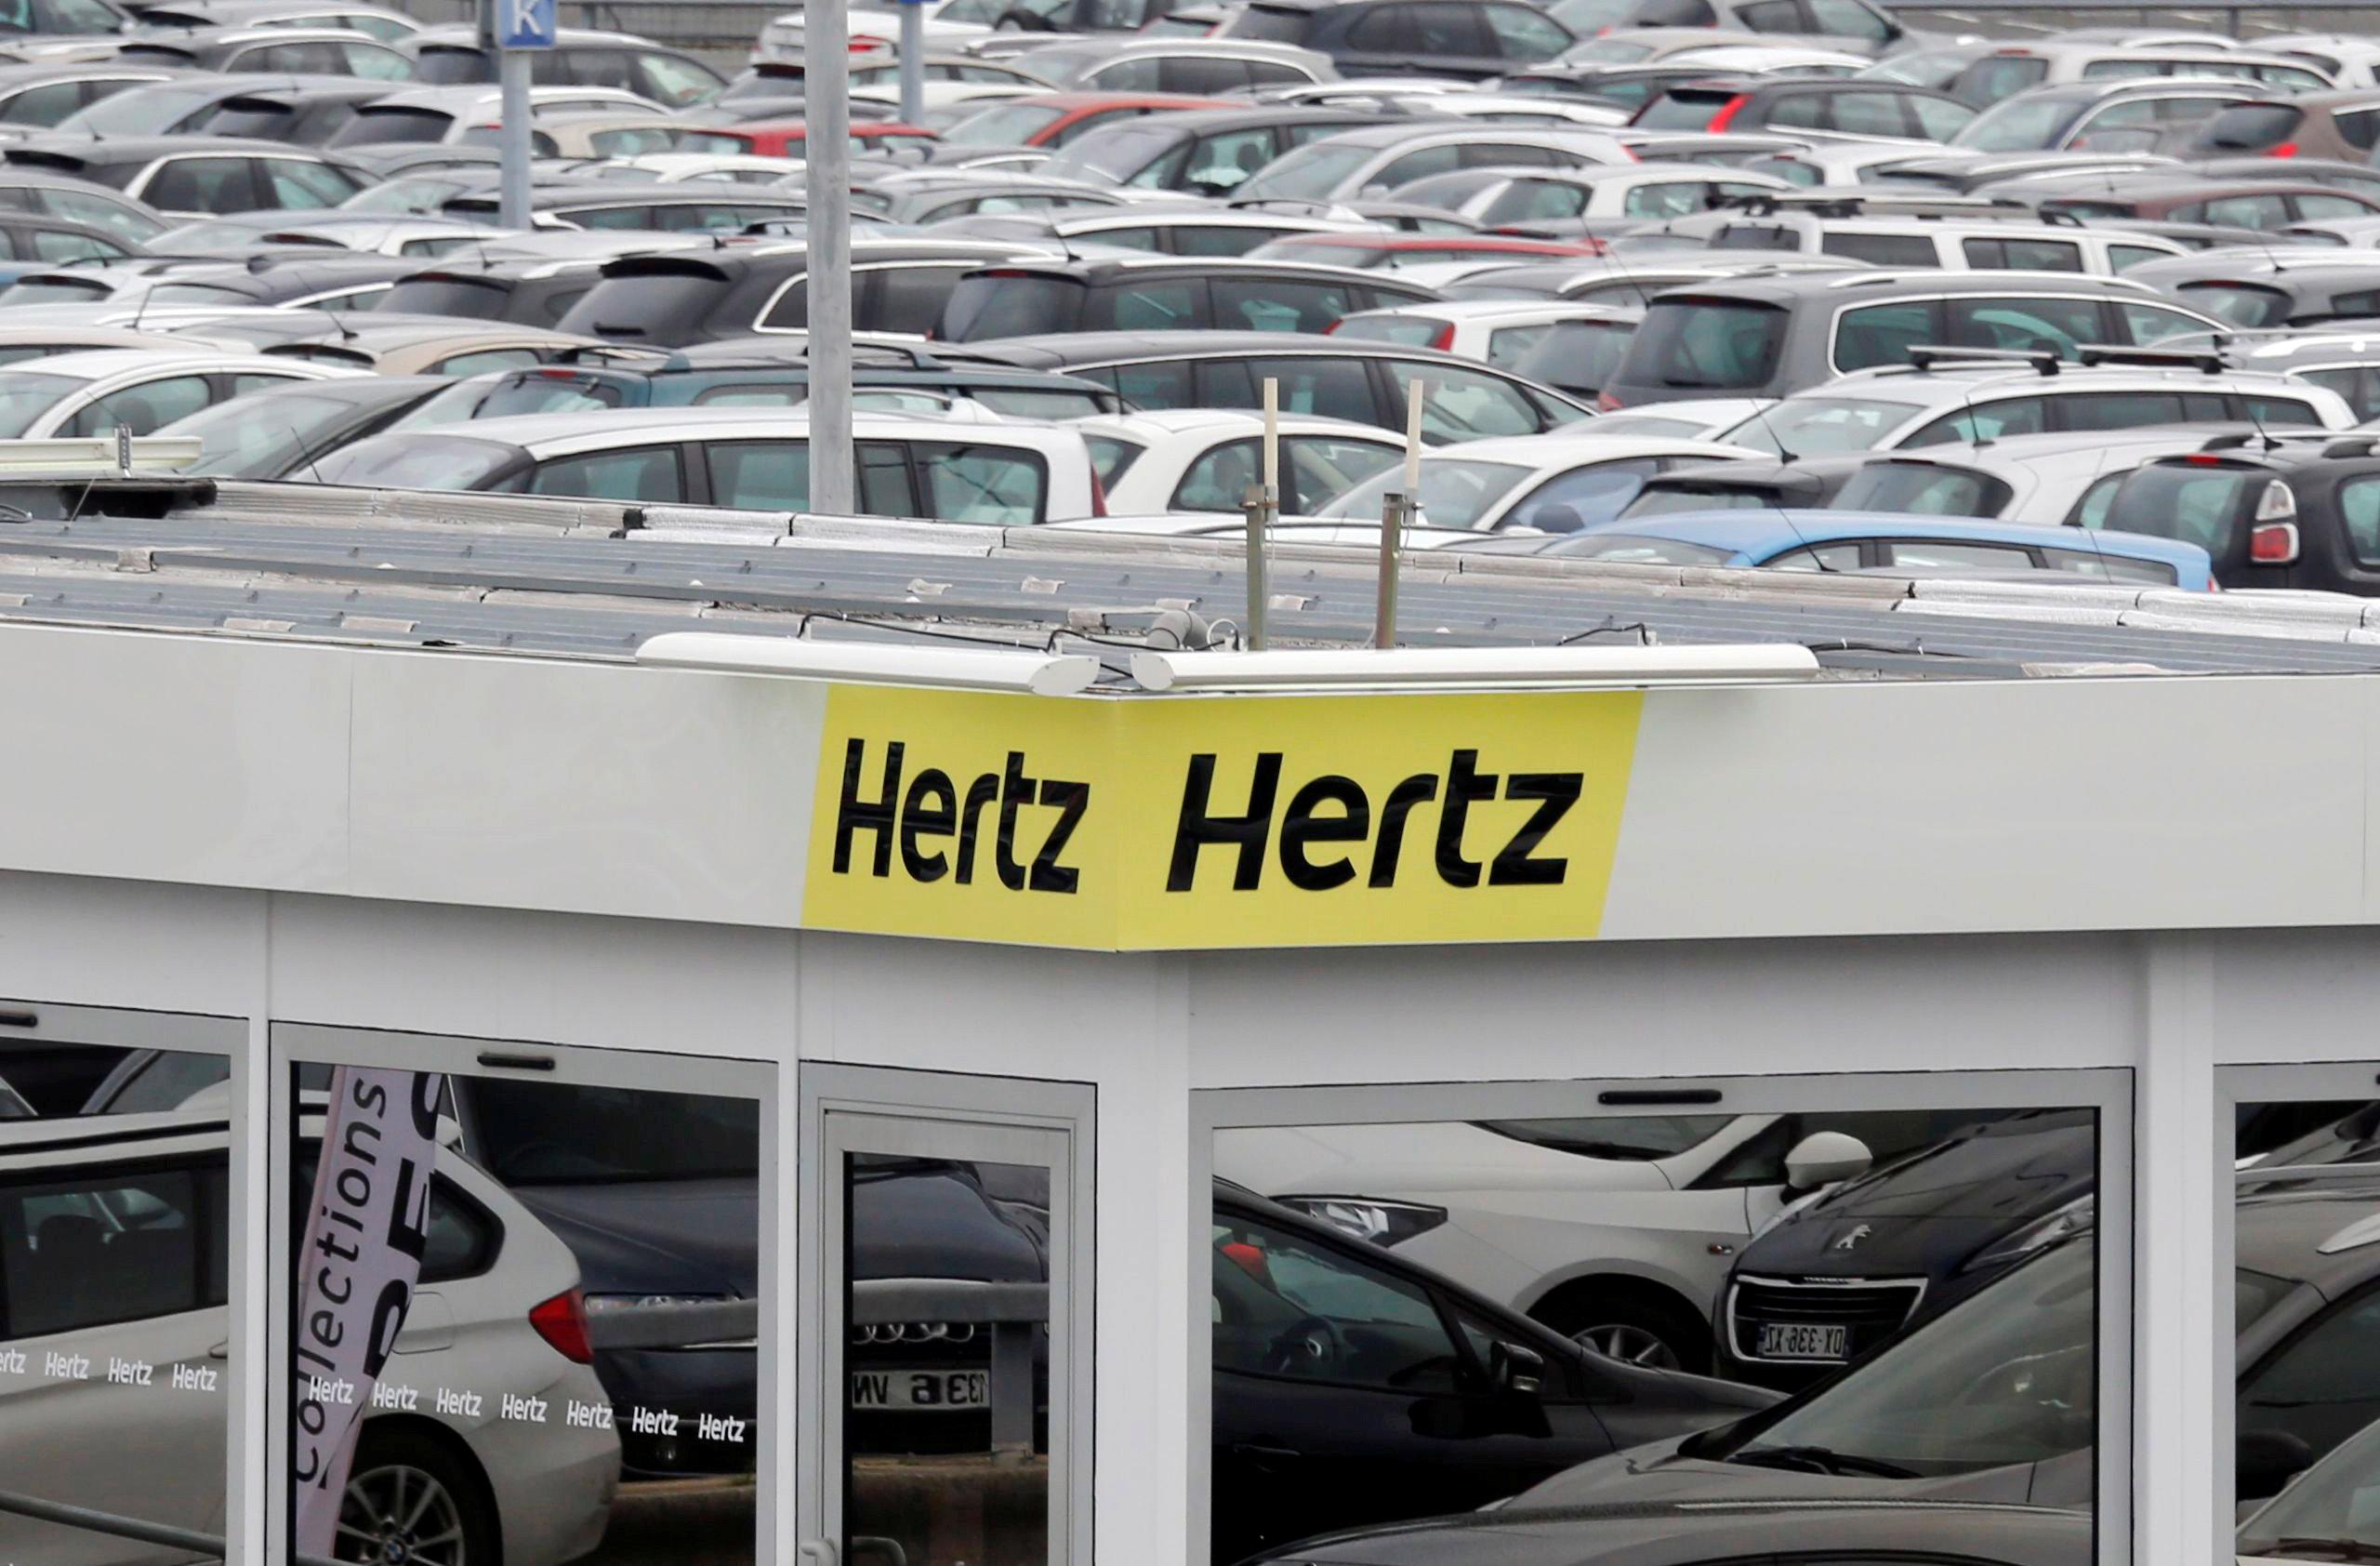 Autohellas Hertz: Αύξηση κερδών 39% το 2017   in.gr